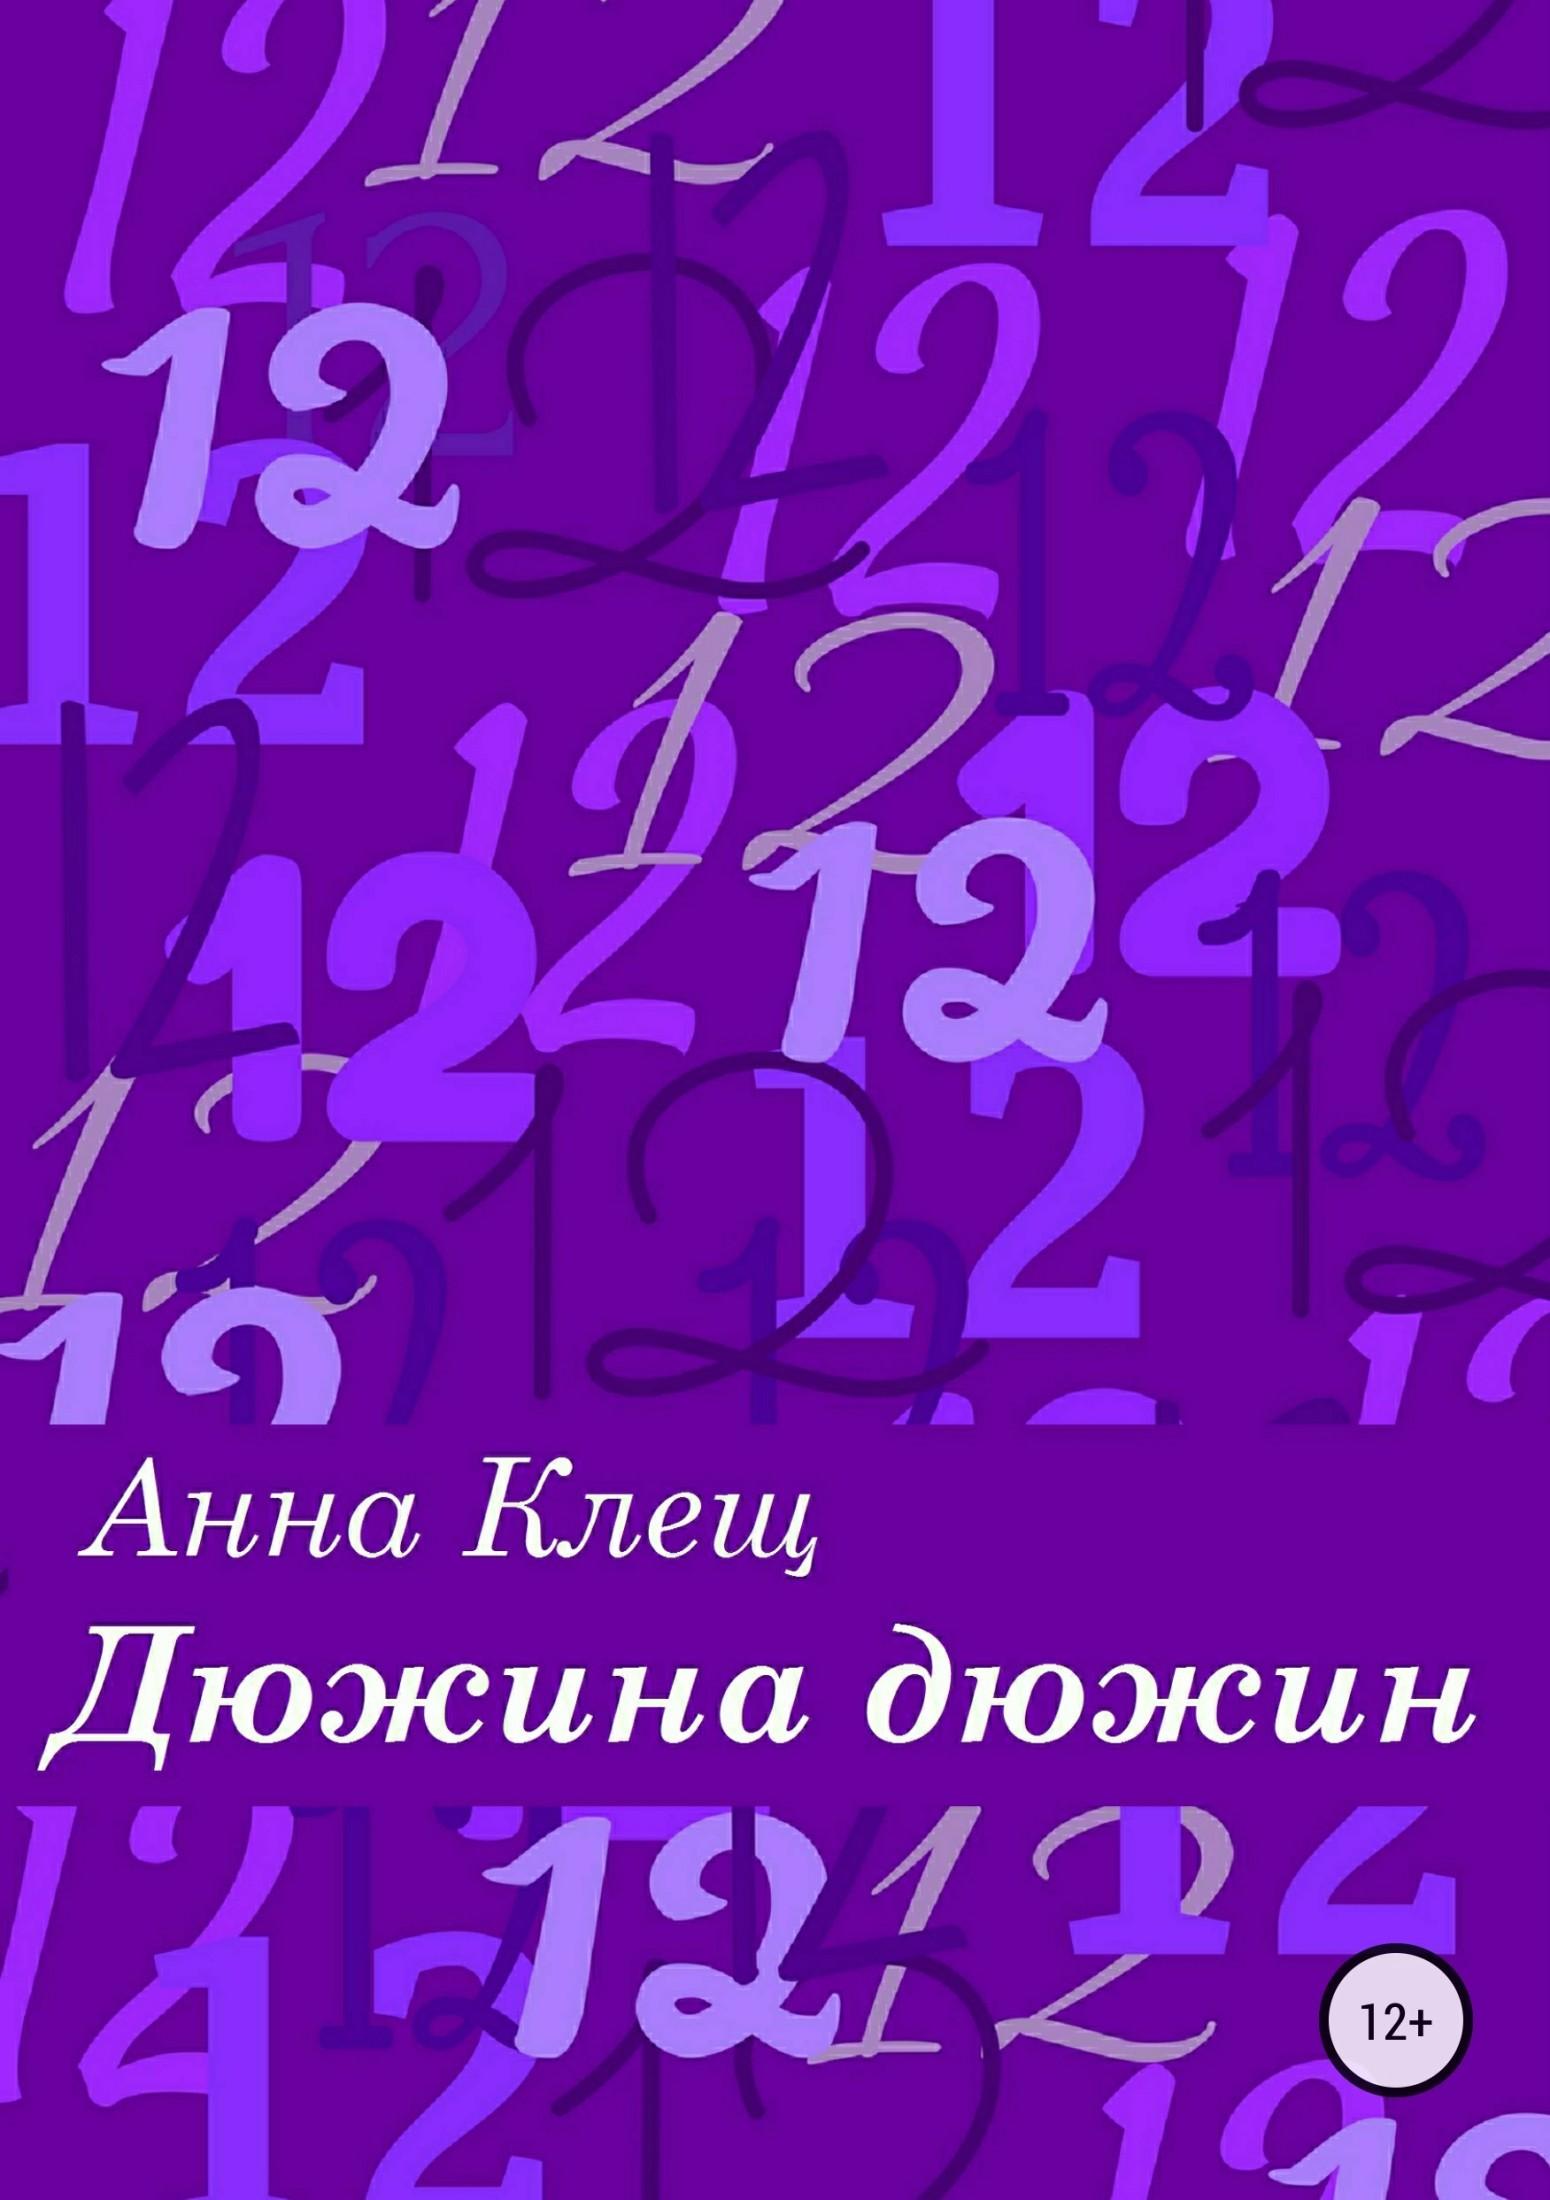 Анна Клещ Дюжина дюжин. Сборник стихотворений сборник о боге – cпасителе мира